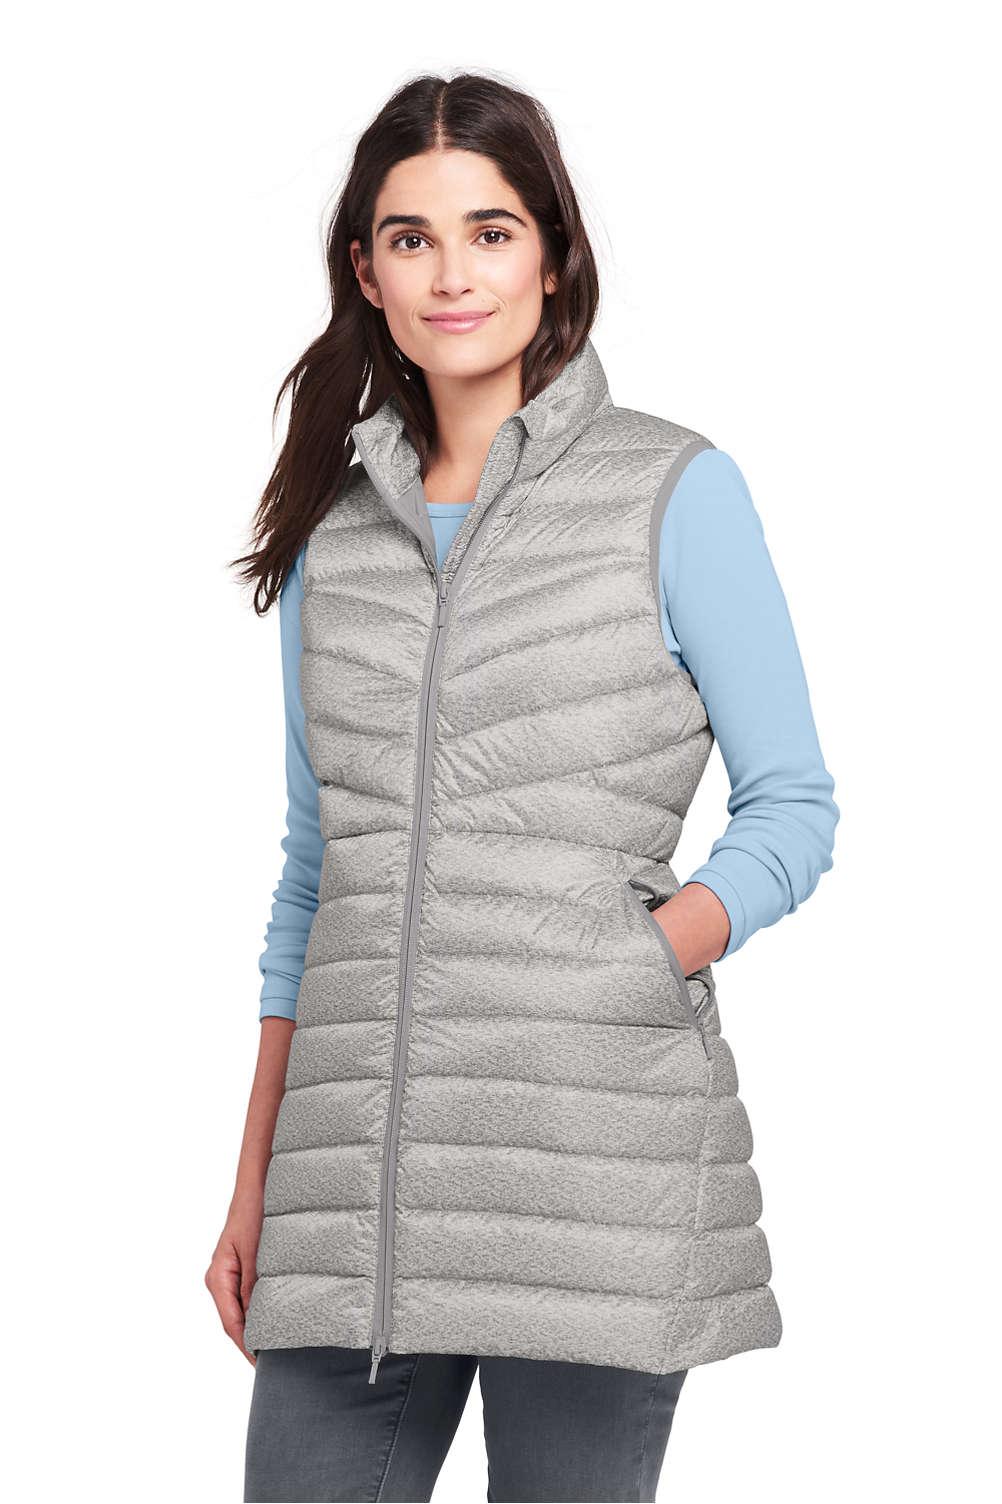 8c8eec6ffa623 Women s Print Ultralight Long Down Vest Packable from Lands  End